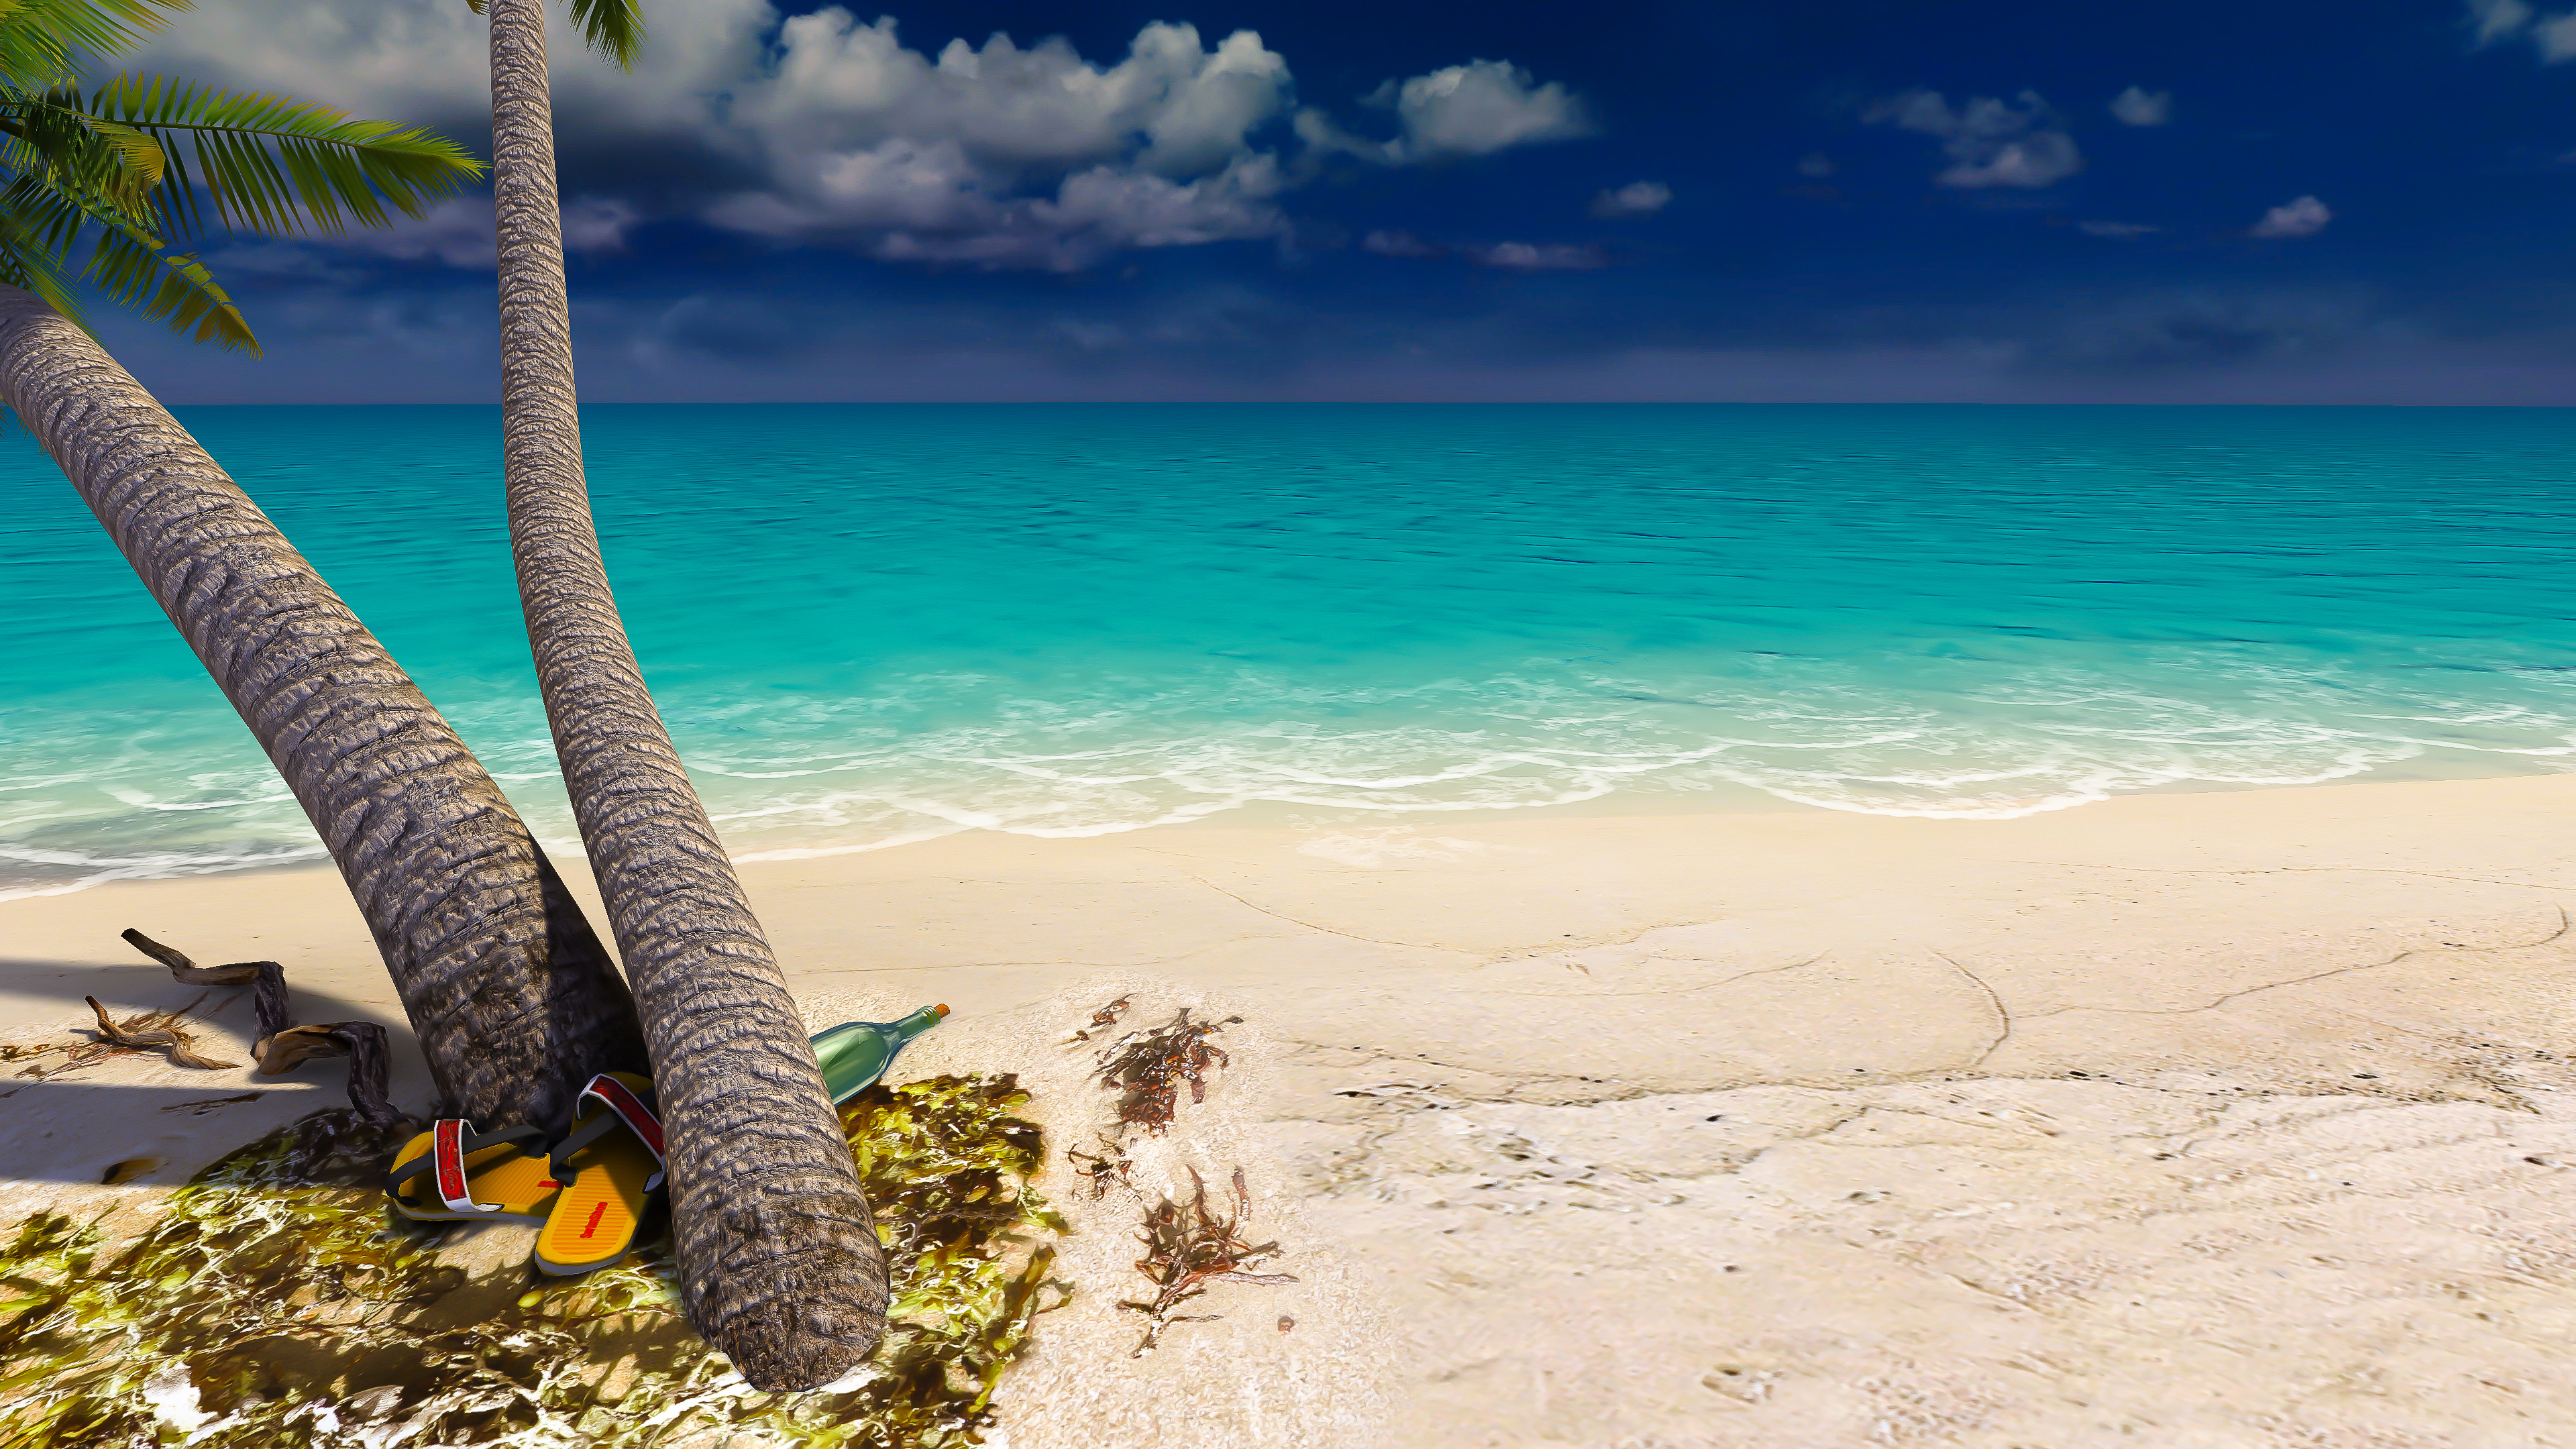 Sandy Beach 4k Ultra Hd Wallpaper Background Image 3840x2160